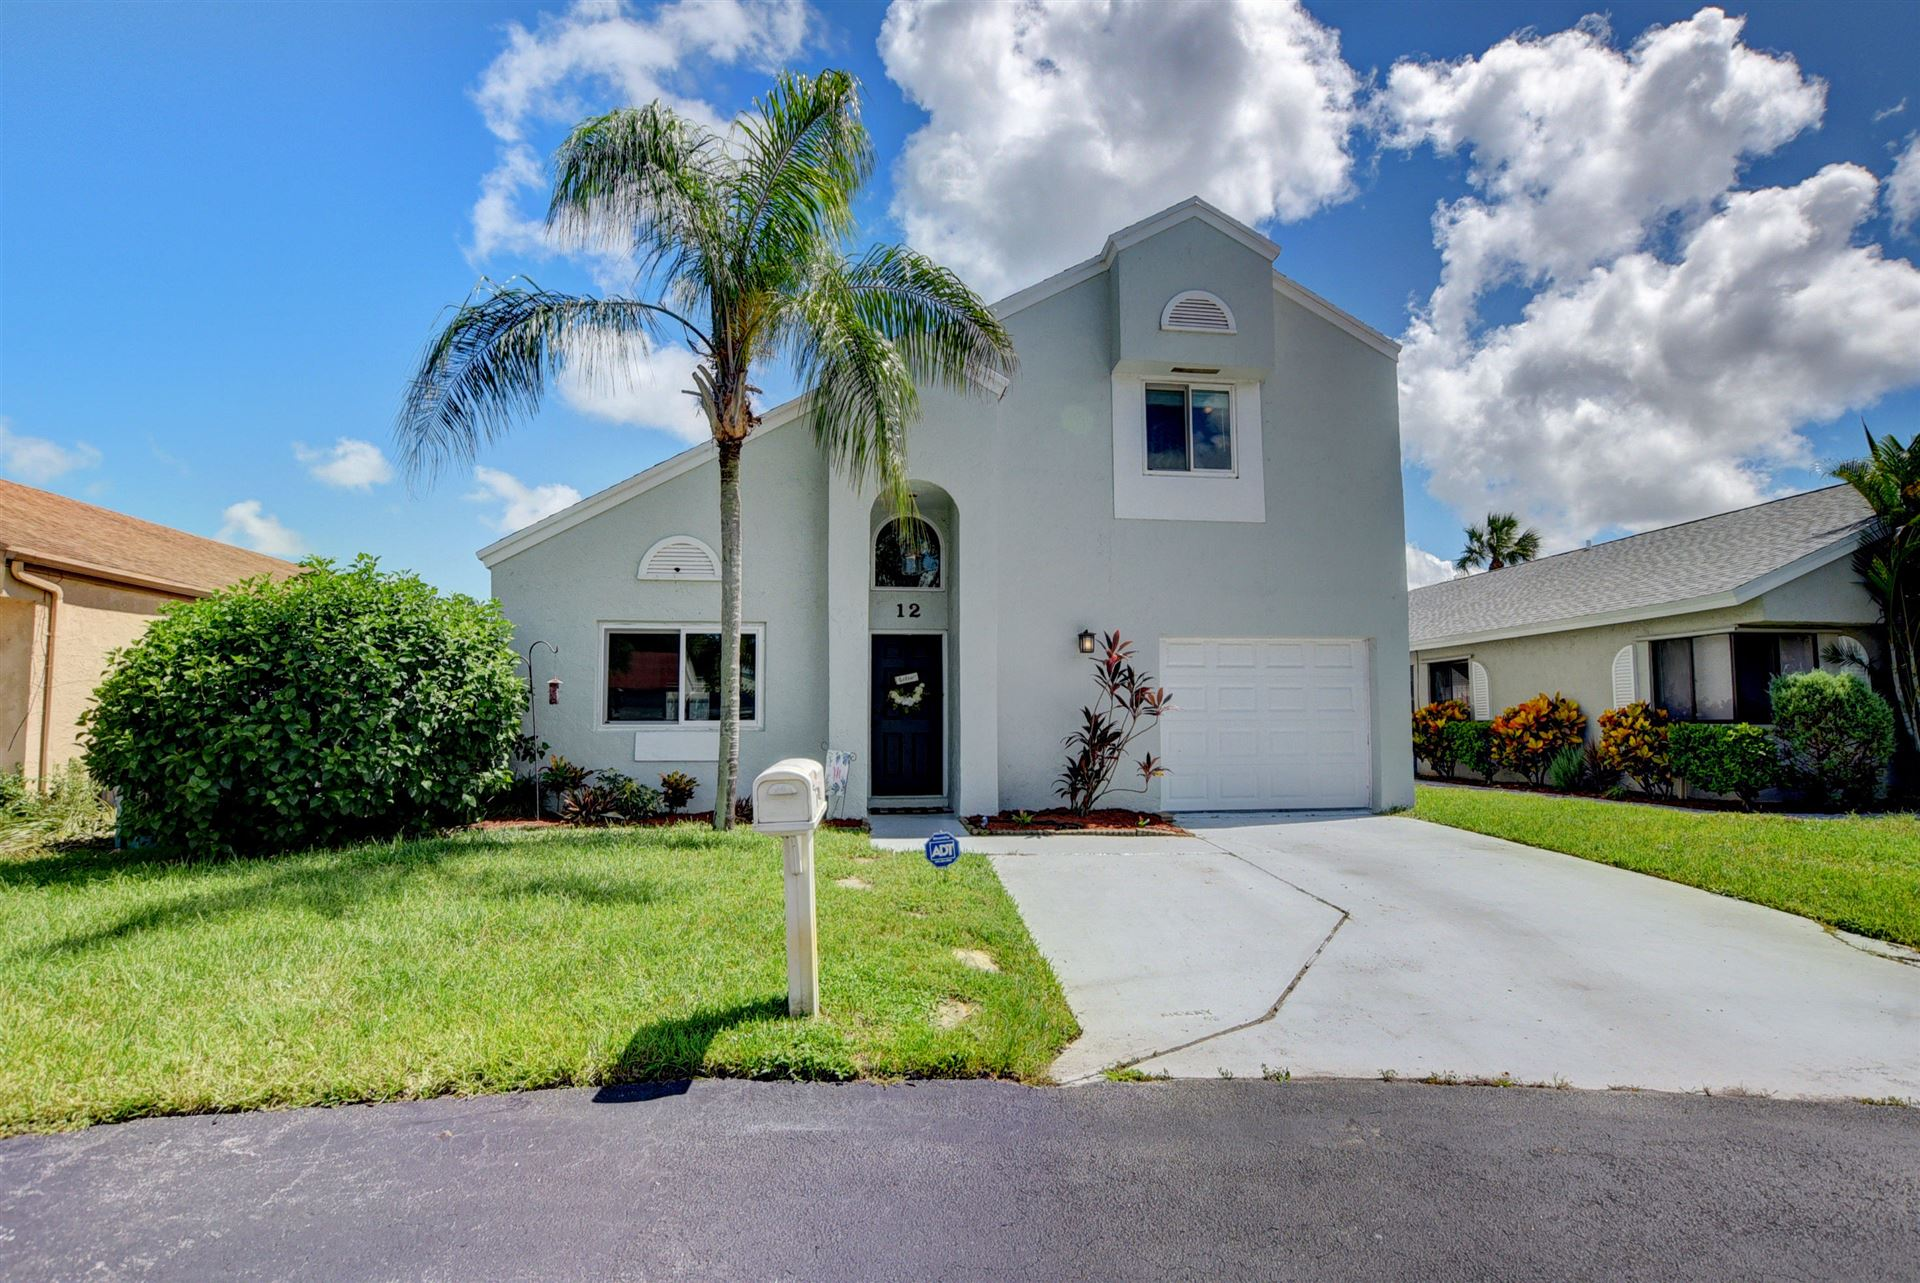 12 Elton Place, Boynton Beach, FL 33426 - #: RX-10645753